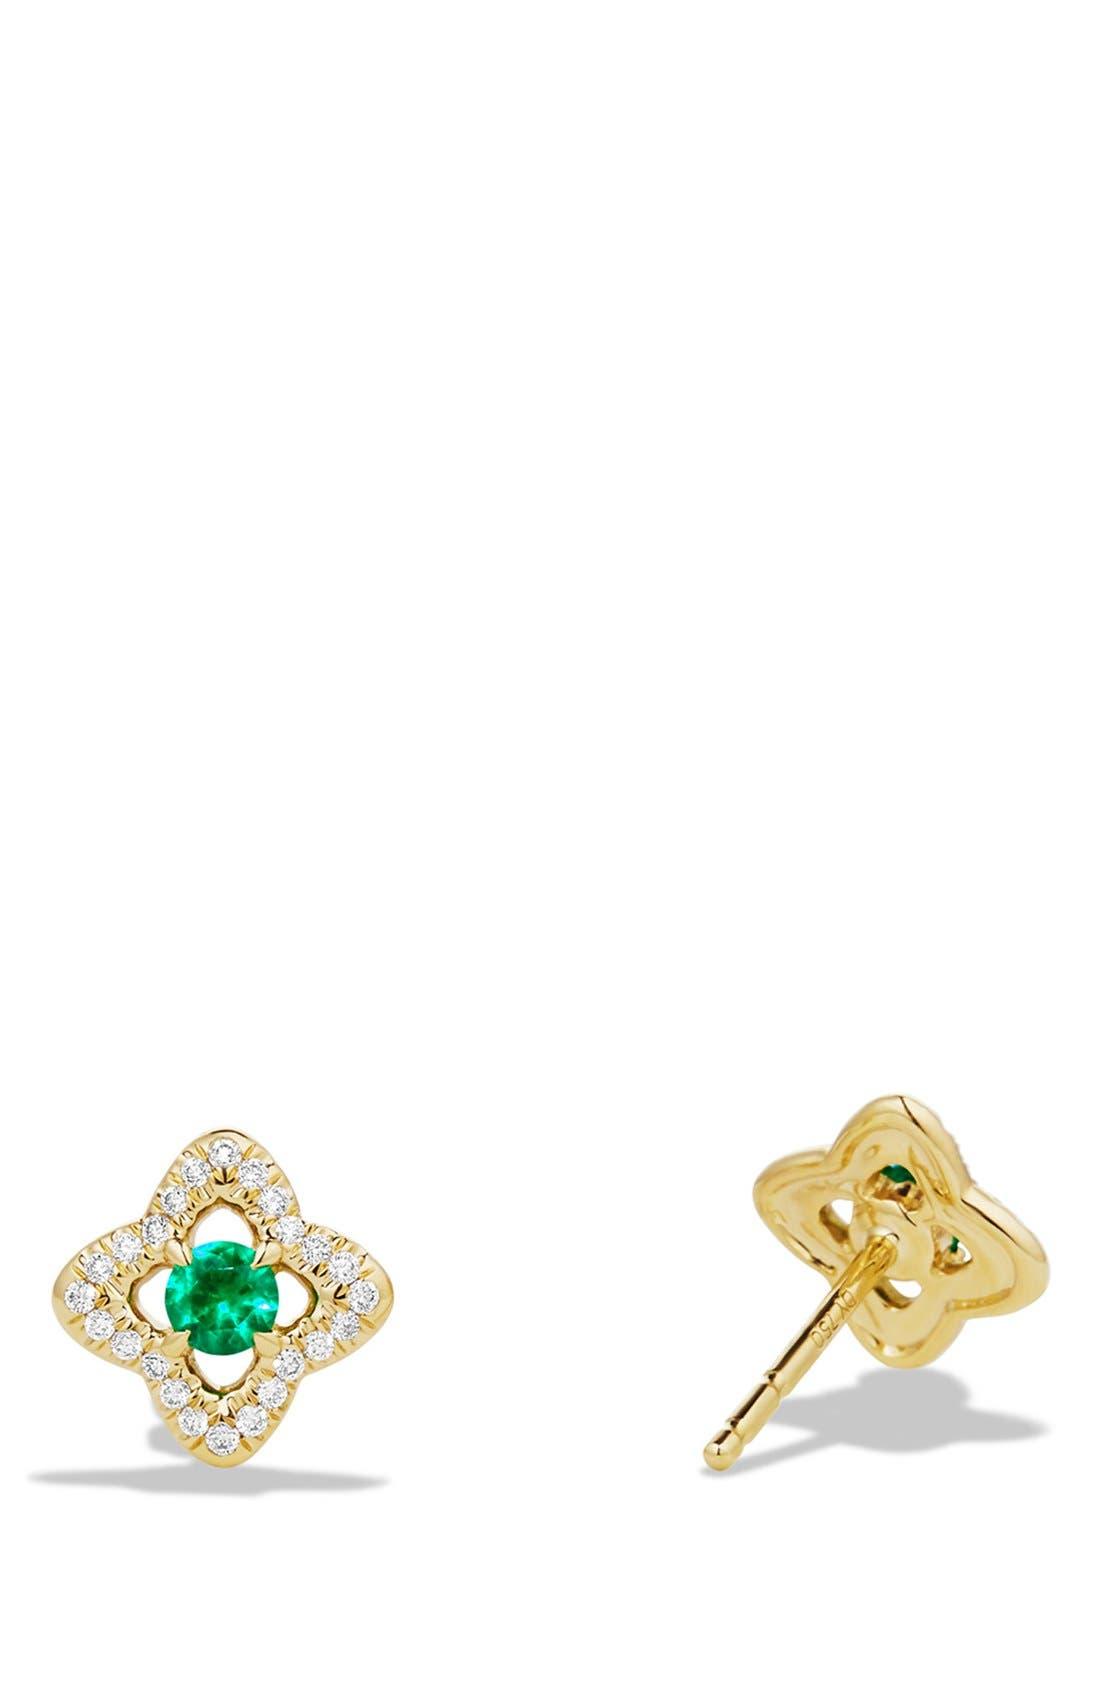 'Venetian Quatrefoil' Earrings with Precious Stones and Diamonds in 18K Gold,                             Alternate thumbnail 3, color,                             EMERALD